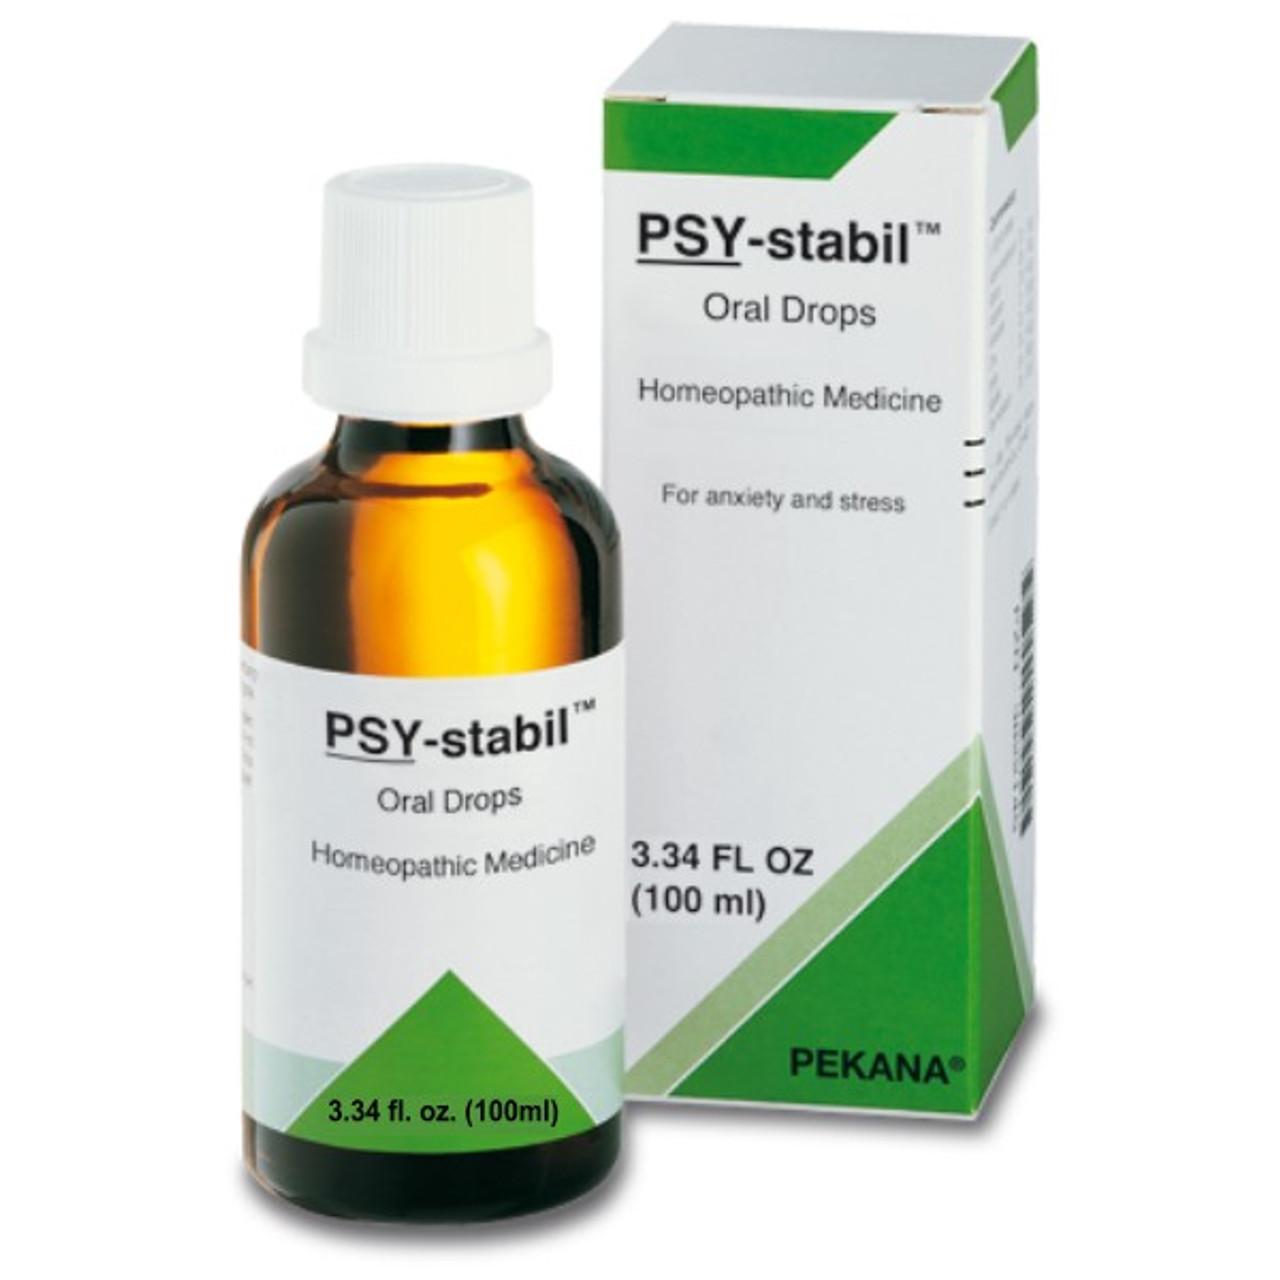 PSY-stabil